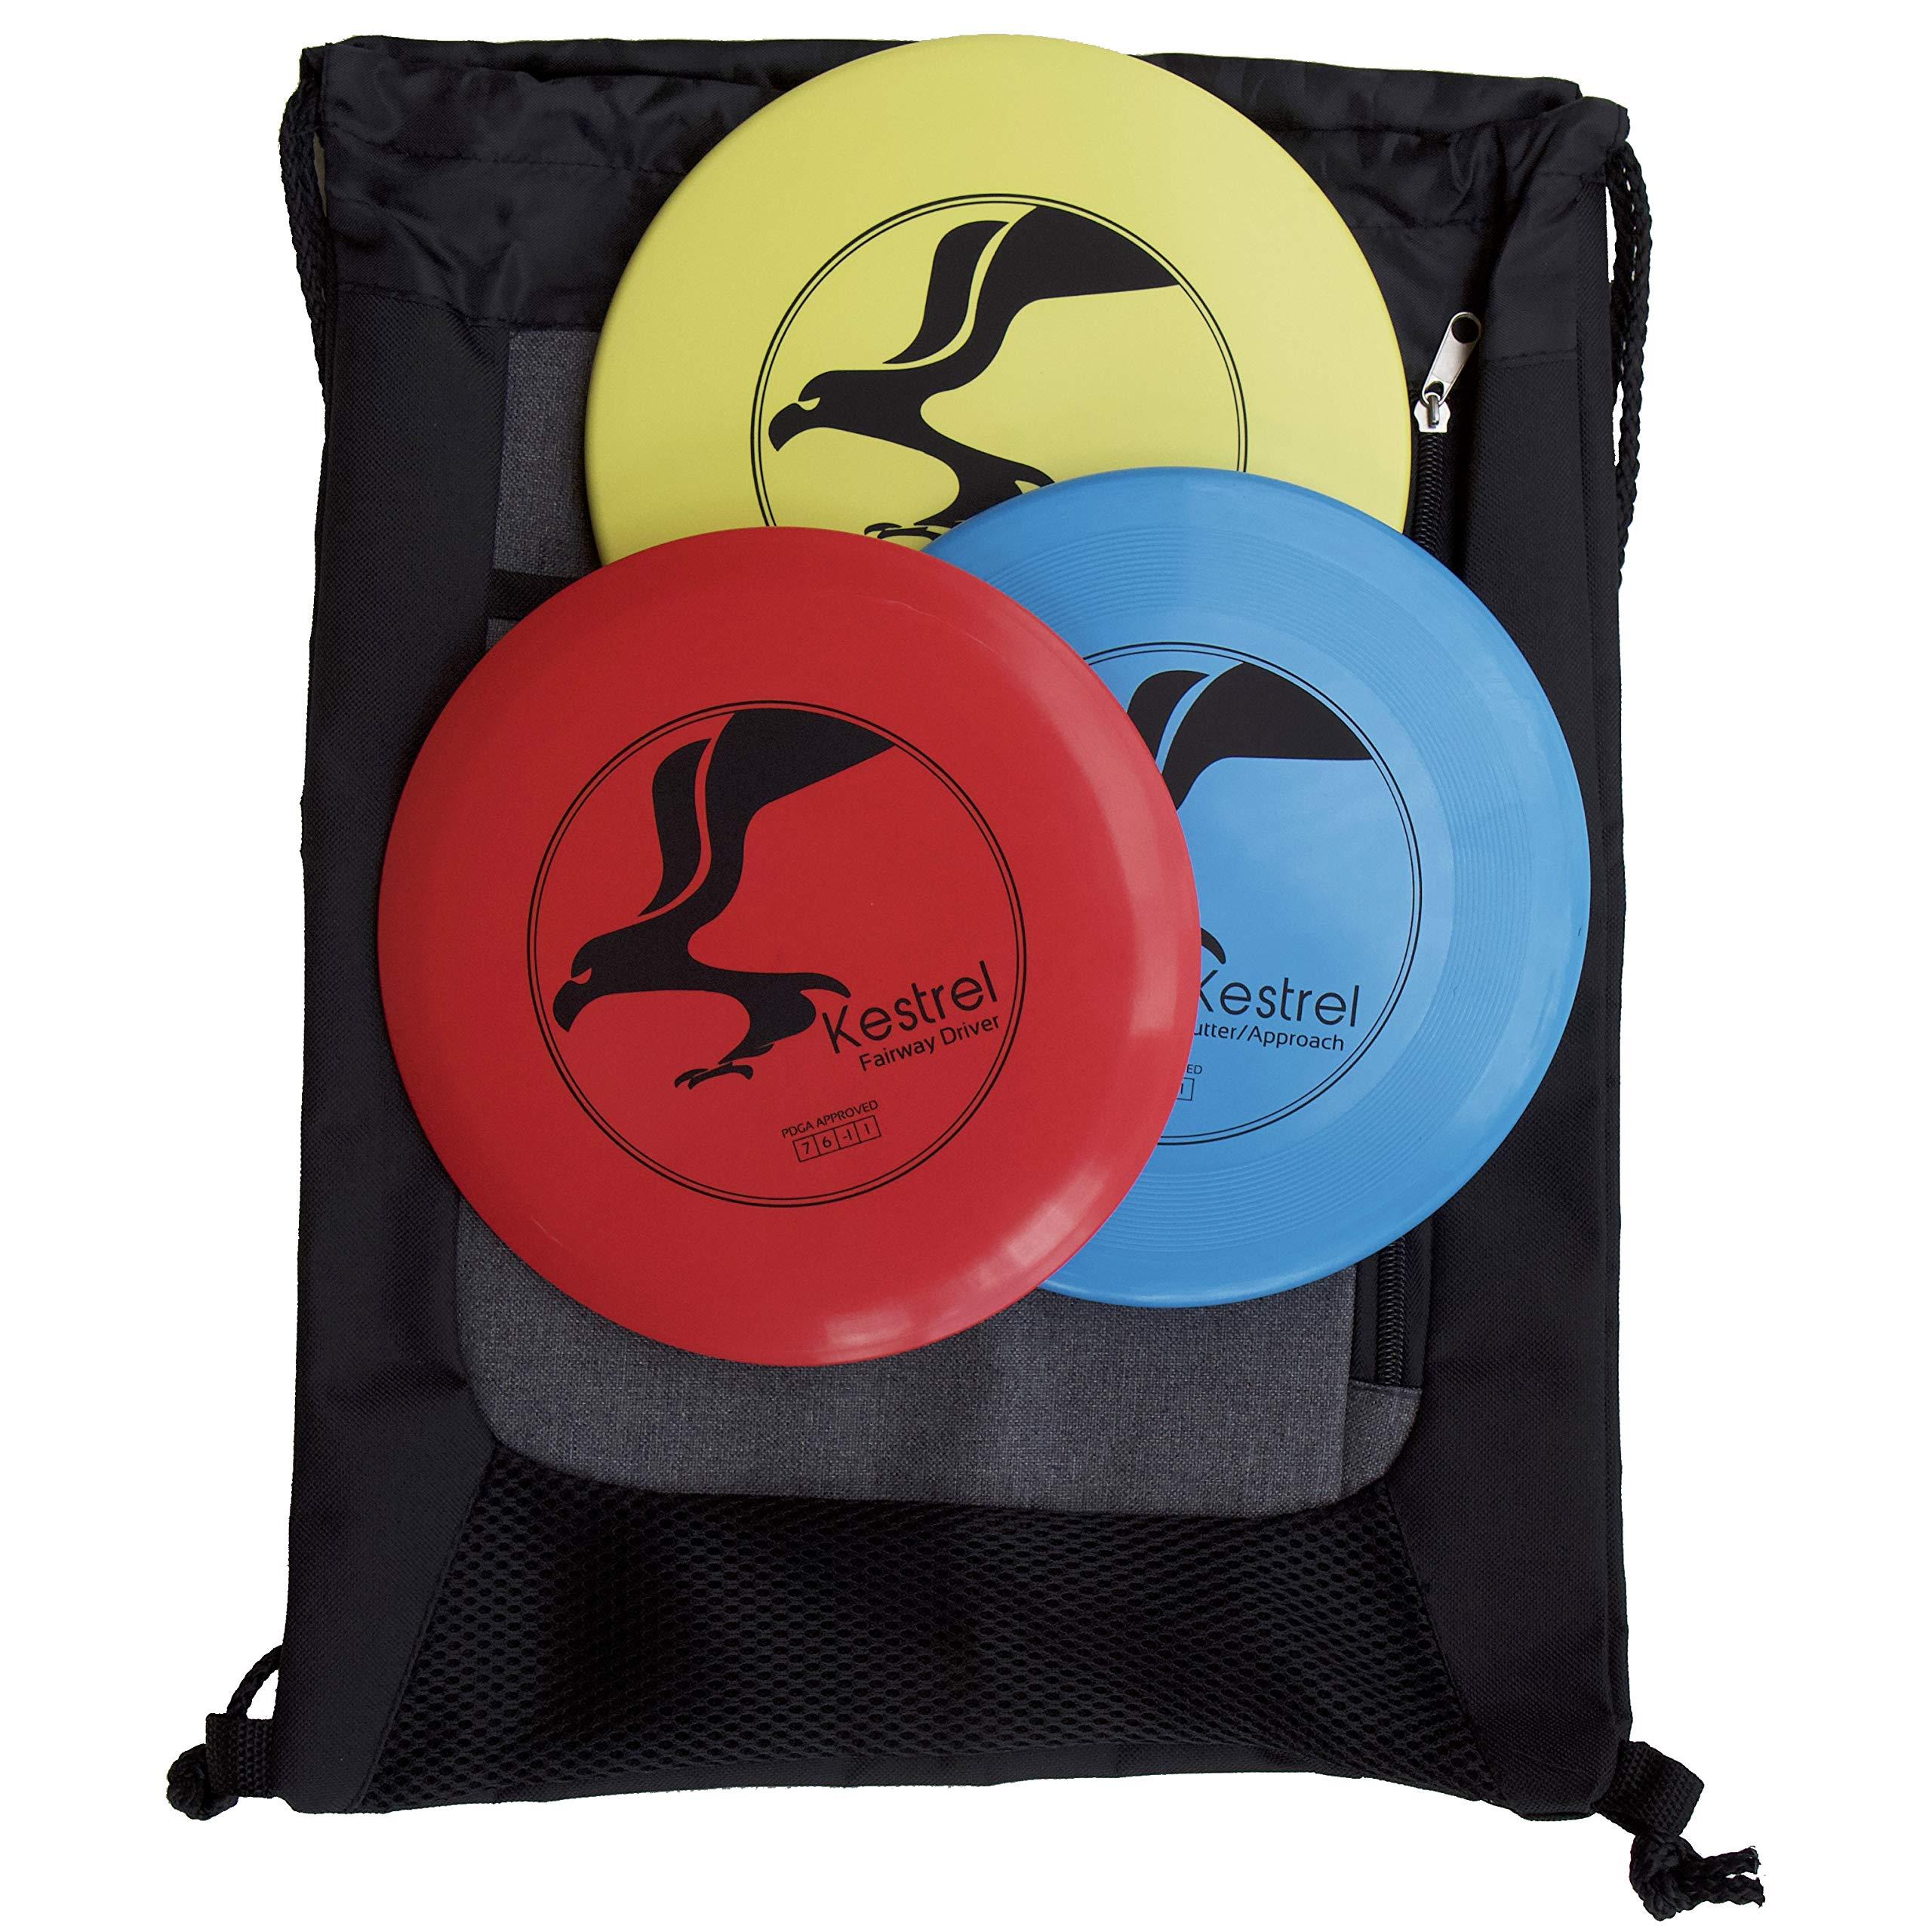 Kestrel Disc Golf Beginner Set Bundle 3 Discs and Bag Includes Fairway Driver, Mid-Range and Putter by Kestrel Sports